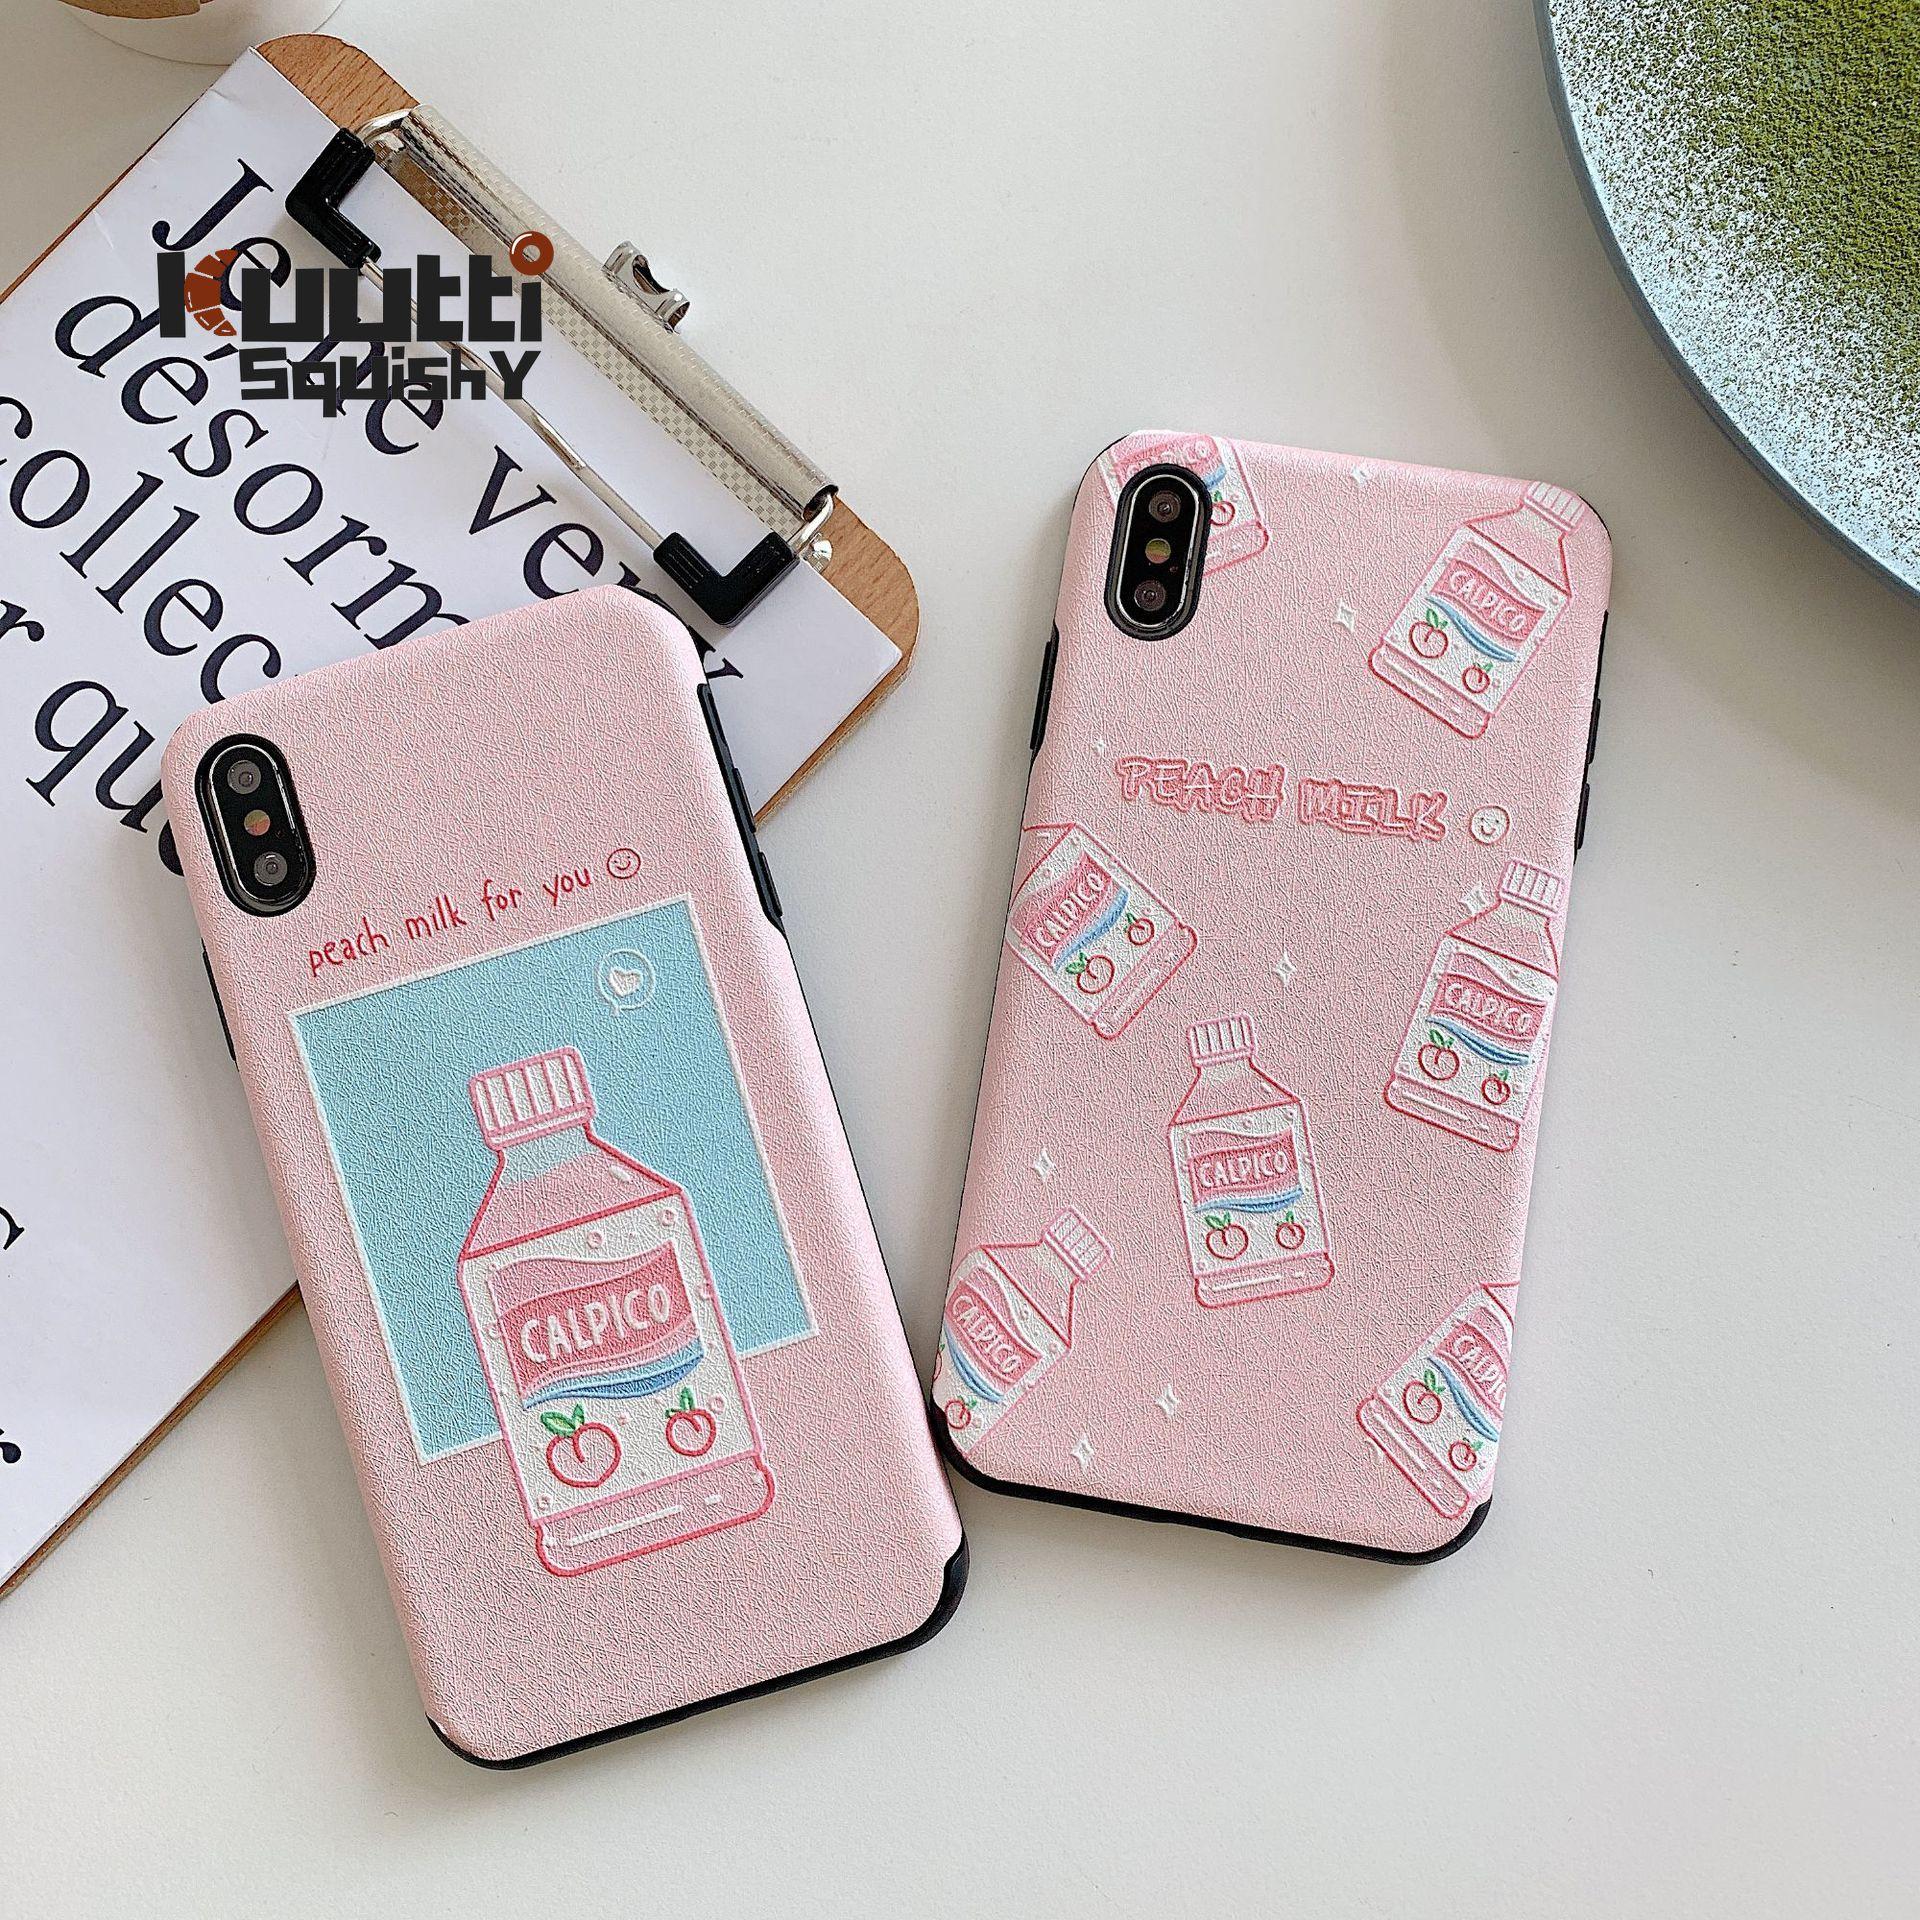 Kuutti Mole Kawaii Leite Pêssego Padrão 3D Relief Phone Cases para iphone 6 6s 7 8 Plus X XR XS Max Capa para iphone 7 plus caso